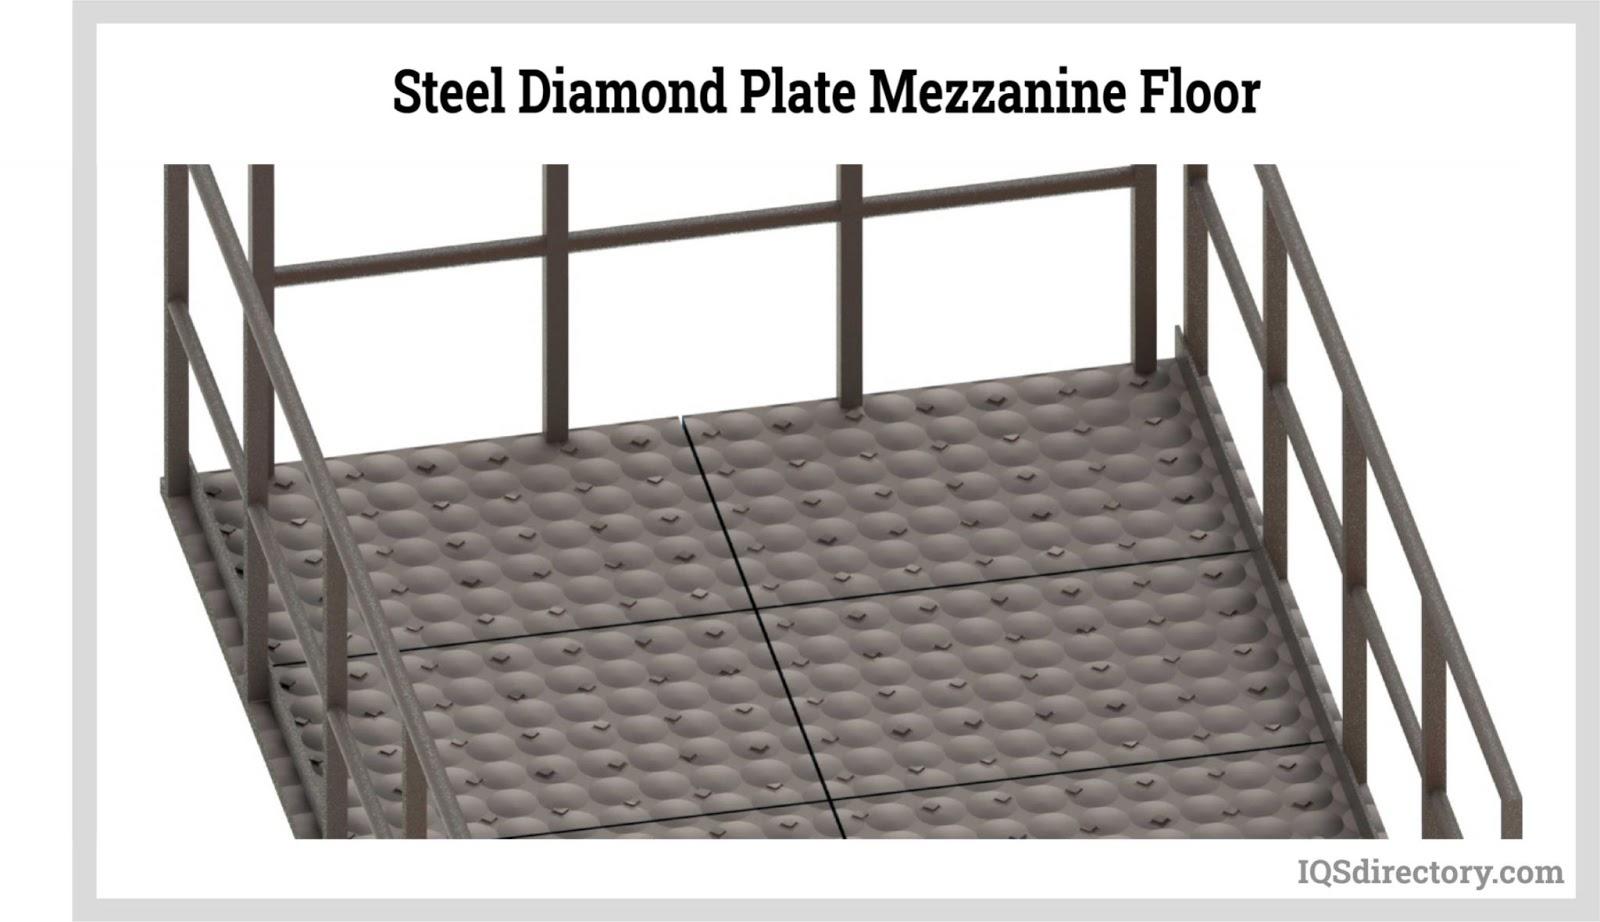 Steel Diamond Plate Mezzanine Floor